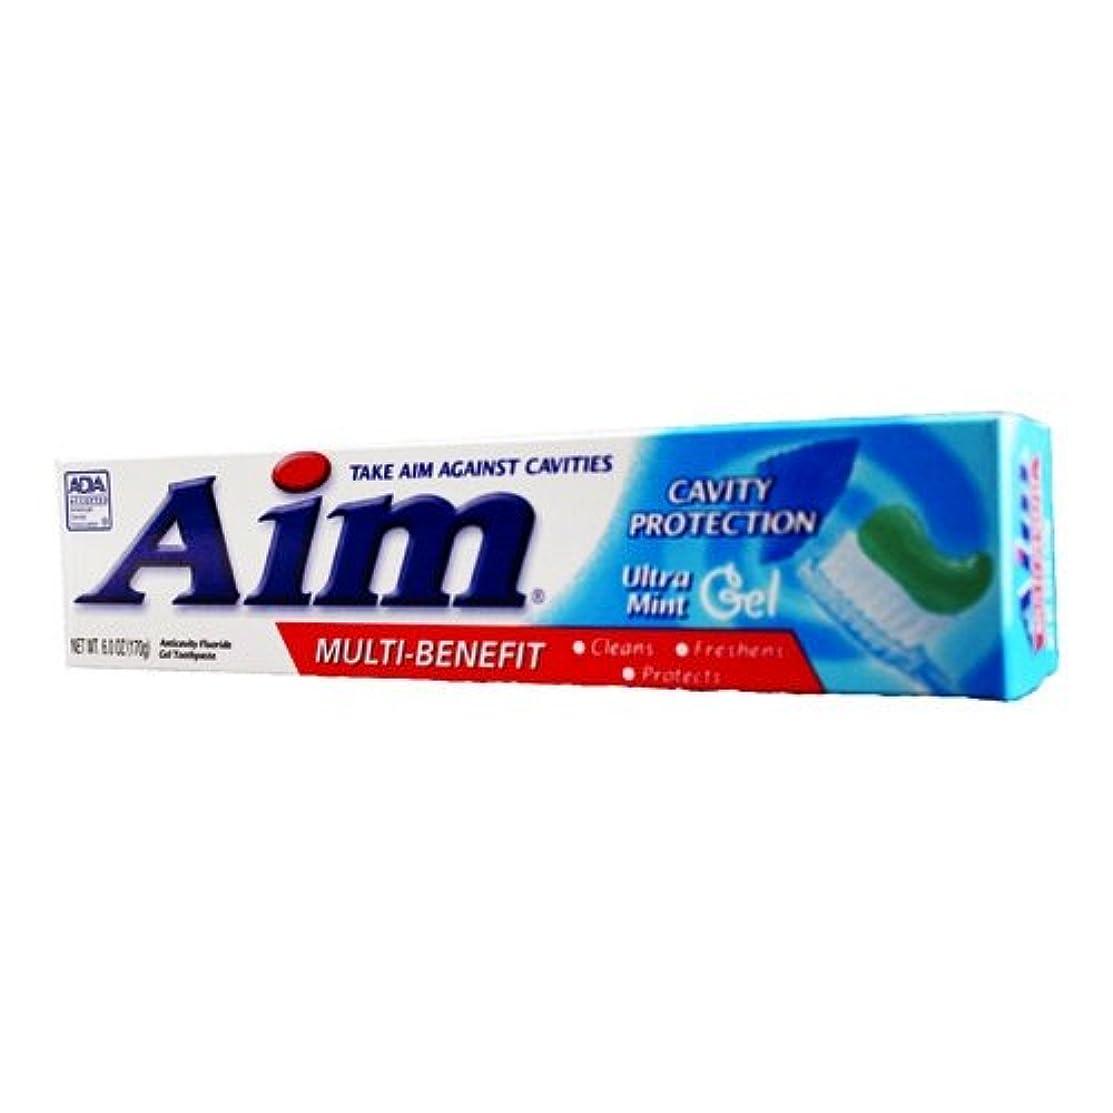 男十分に変成器Aim Cavity Protection Anticavity Fluoride Toothpaste, Ultra Mint Gel 180 ml (Pack of 12) (並行輸入品)